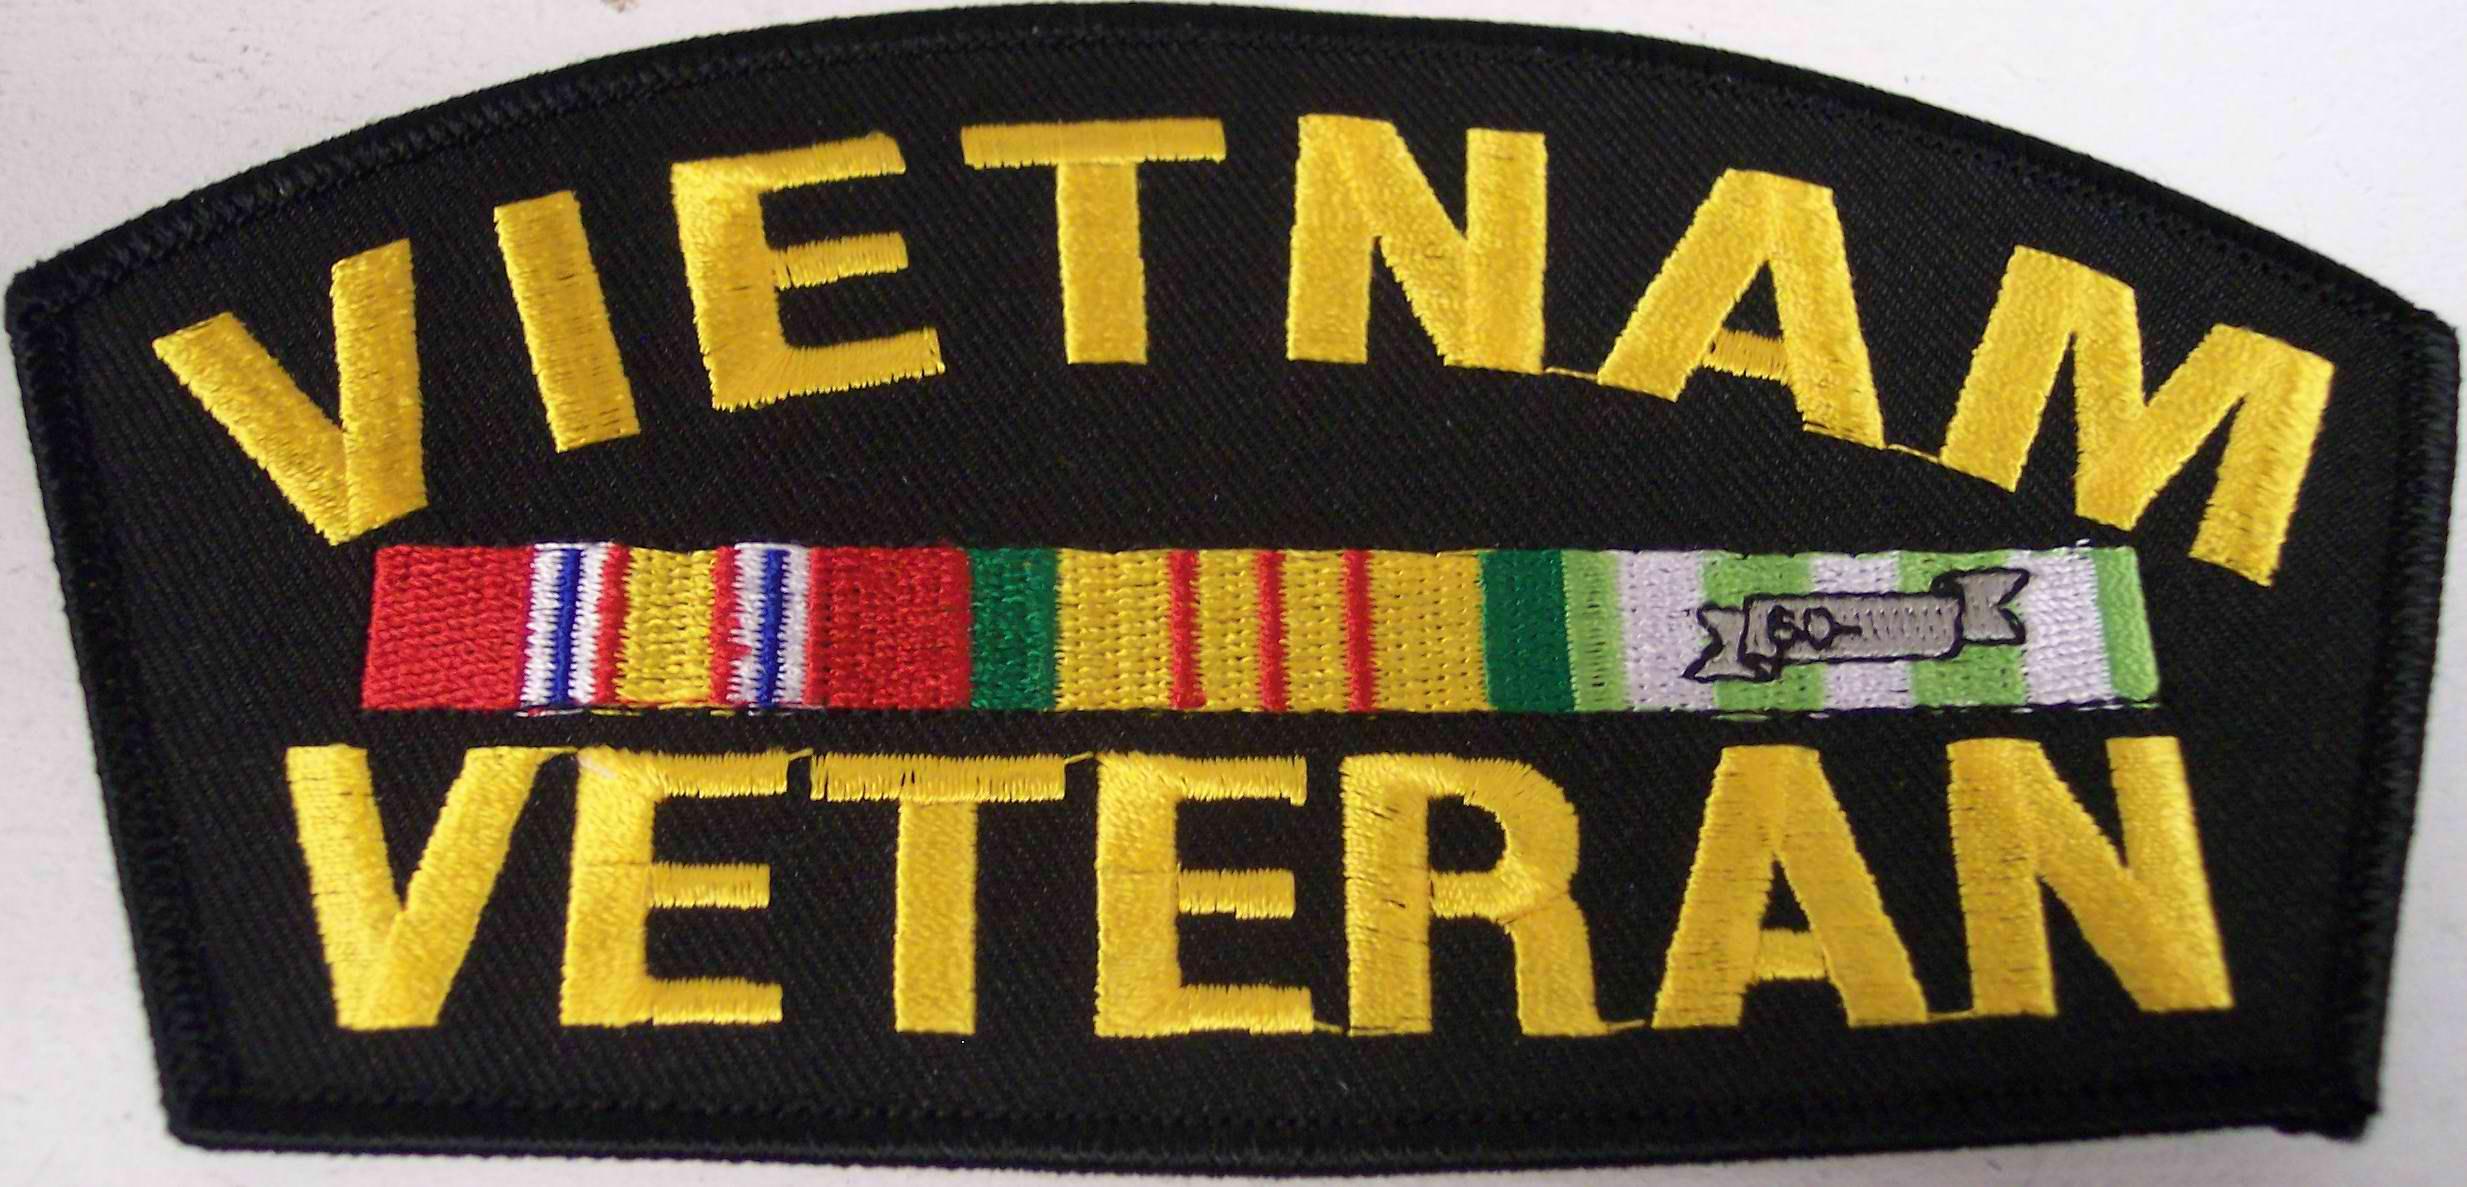 Vietnam Veteran Ribbon Patch.